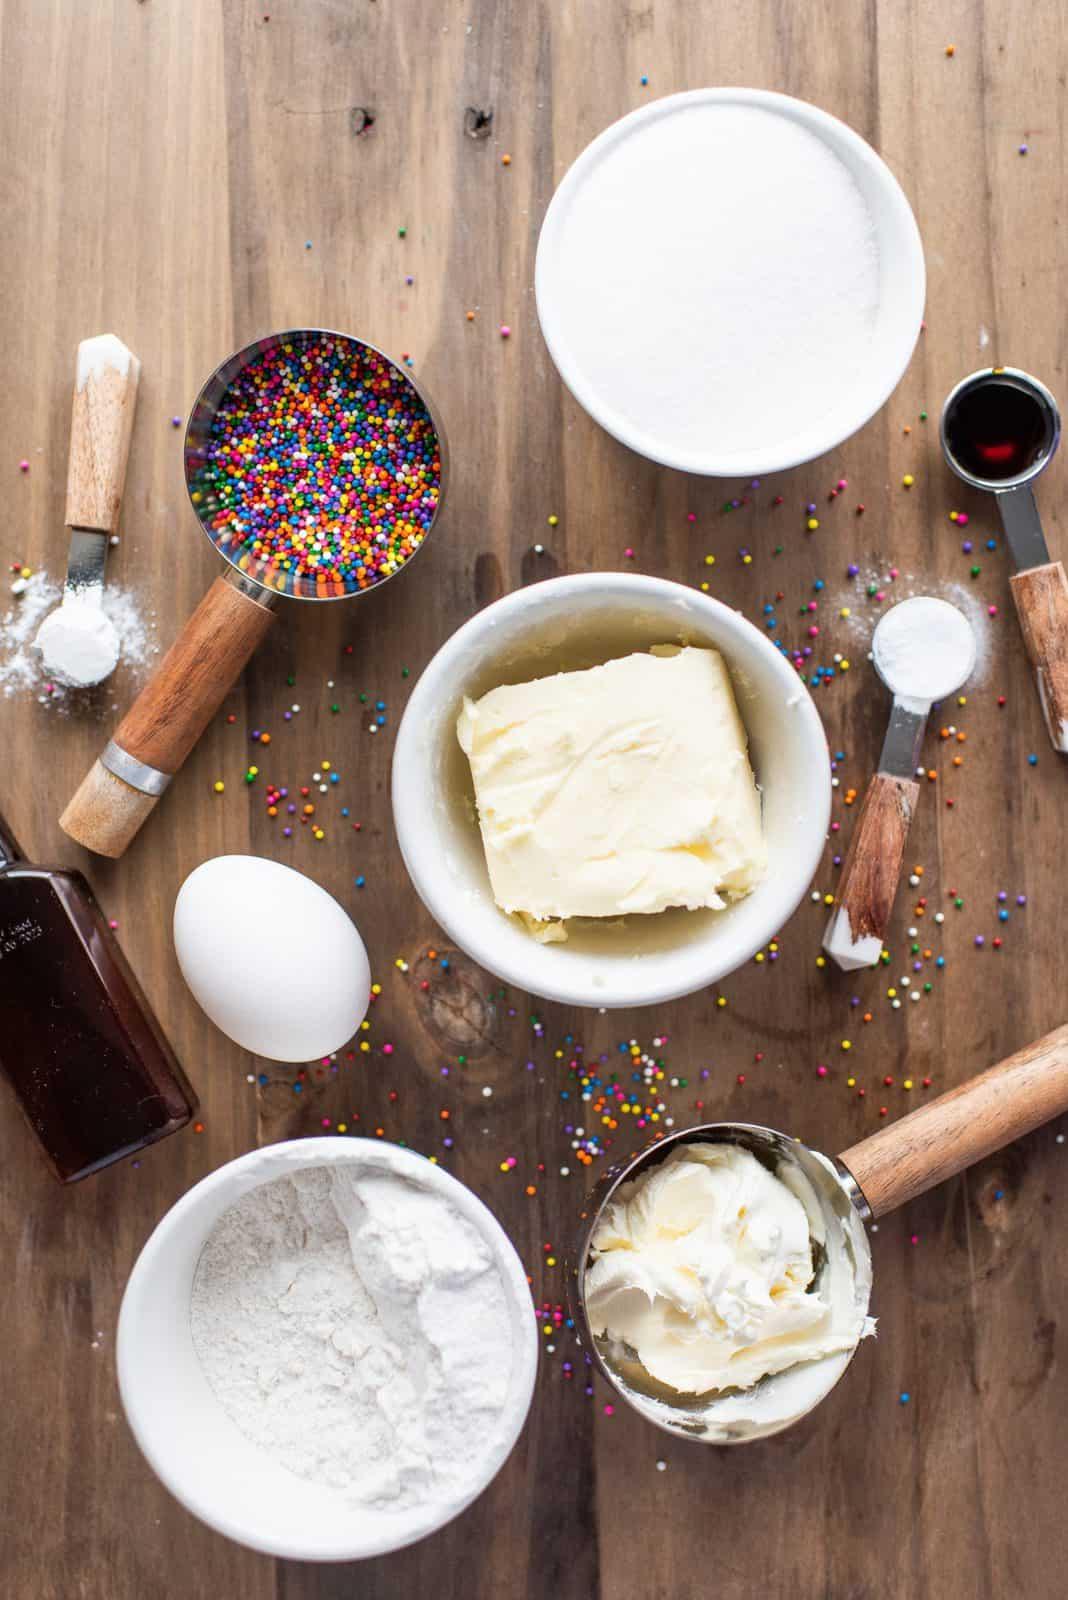 Ingredients needed: all-purpose flour, baking powder, baking soda, salted butter, granulated sugar, cream cheese, egg, vanilla extractand nonpareils.